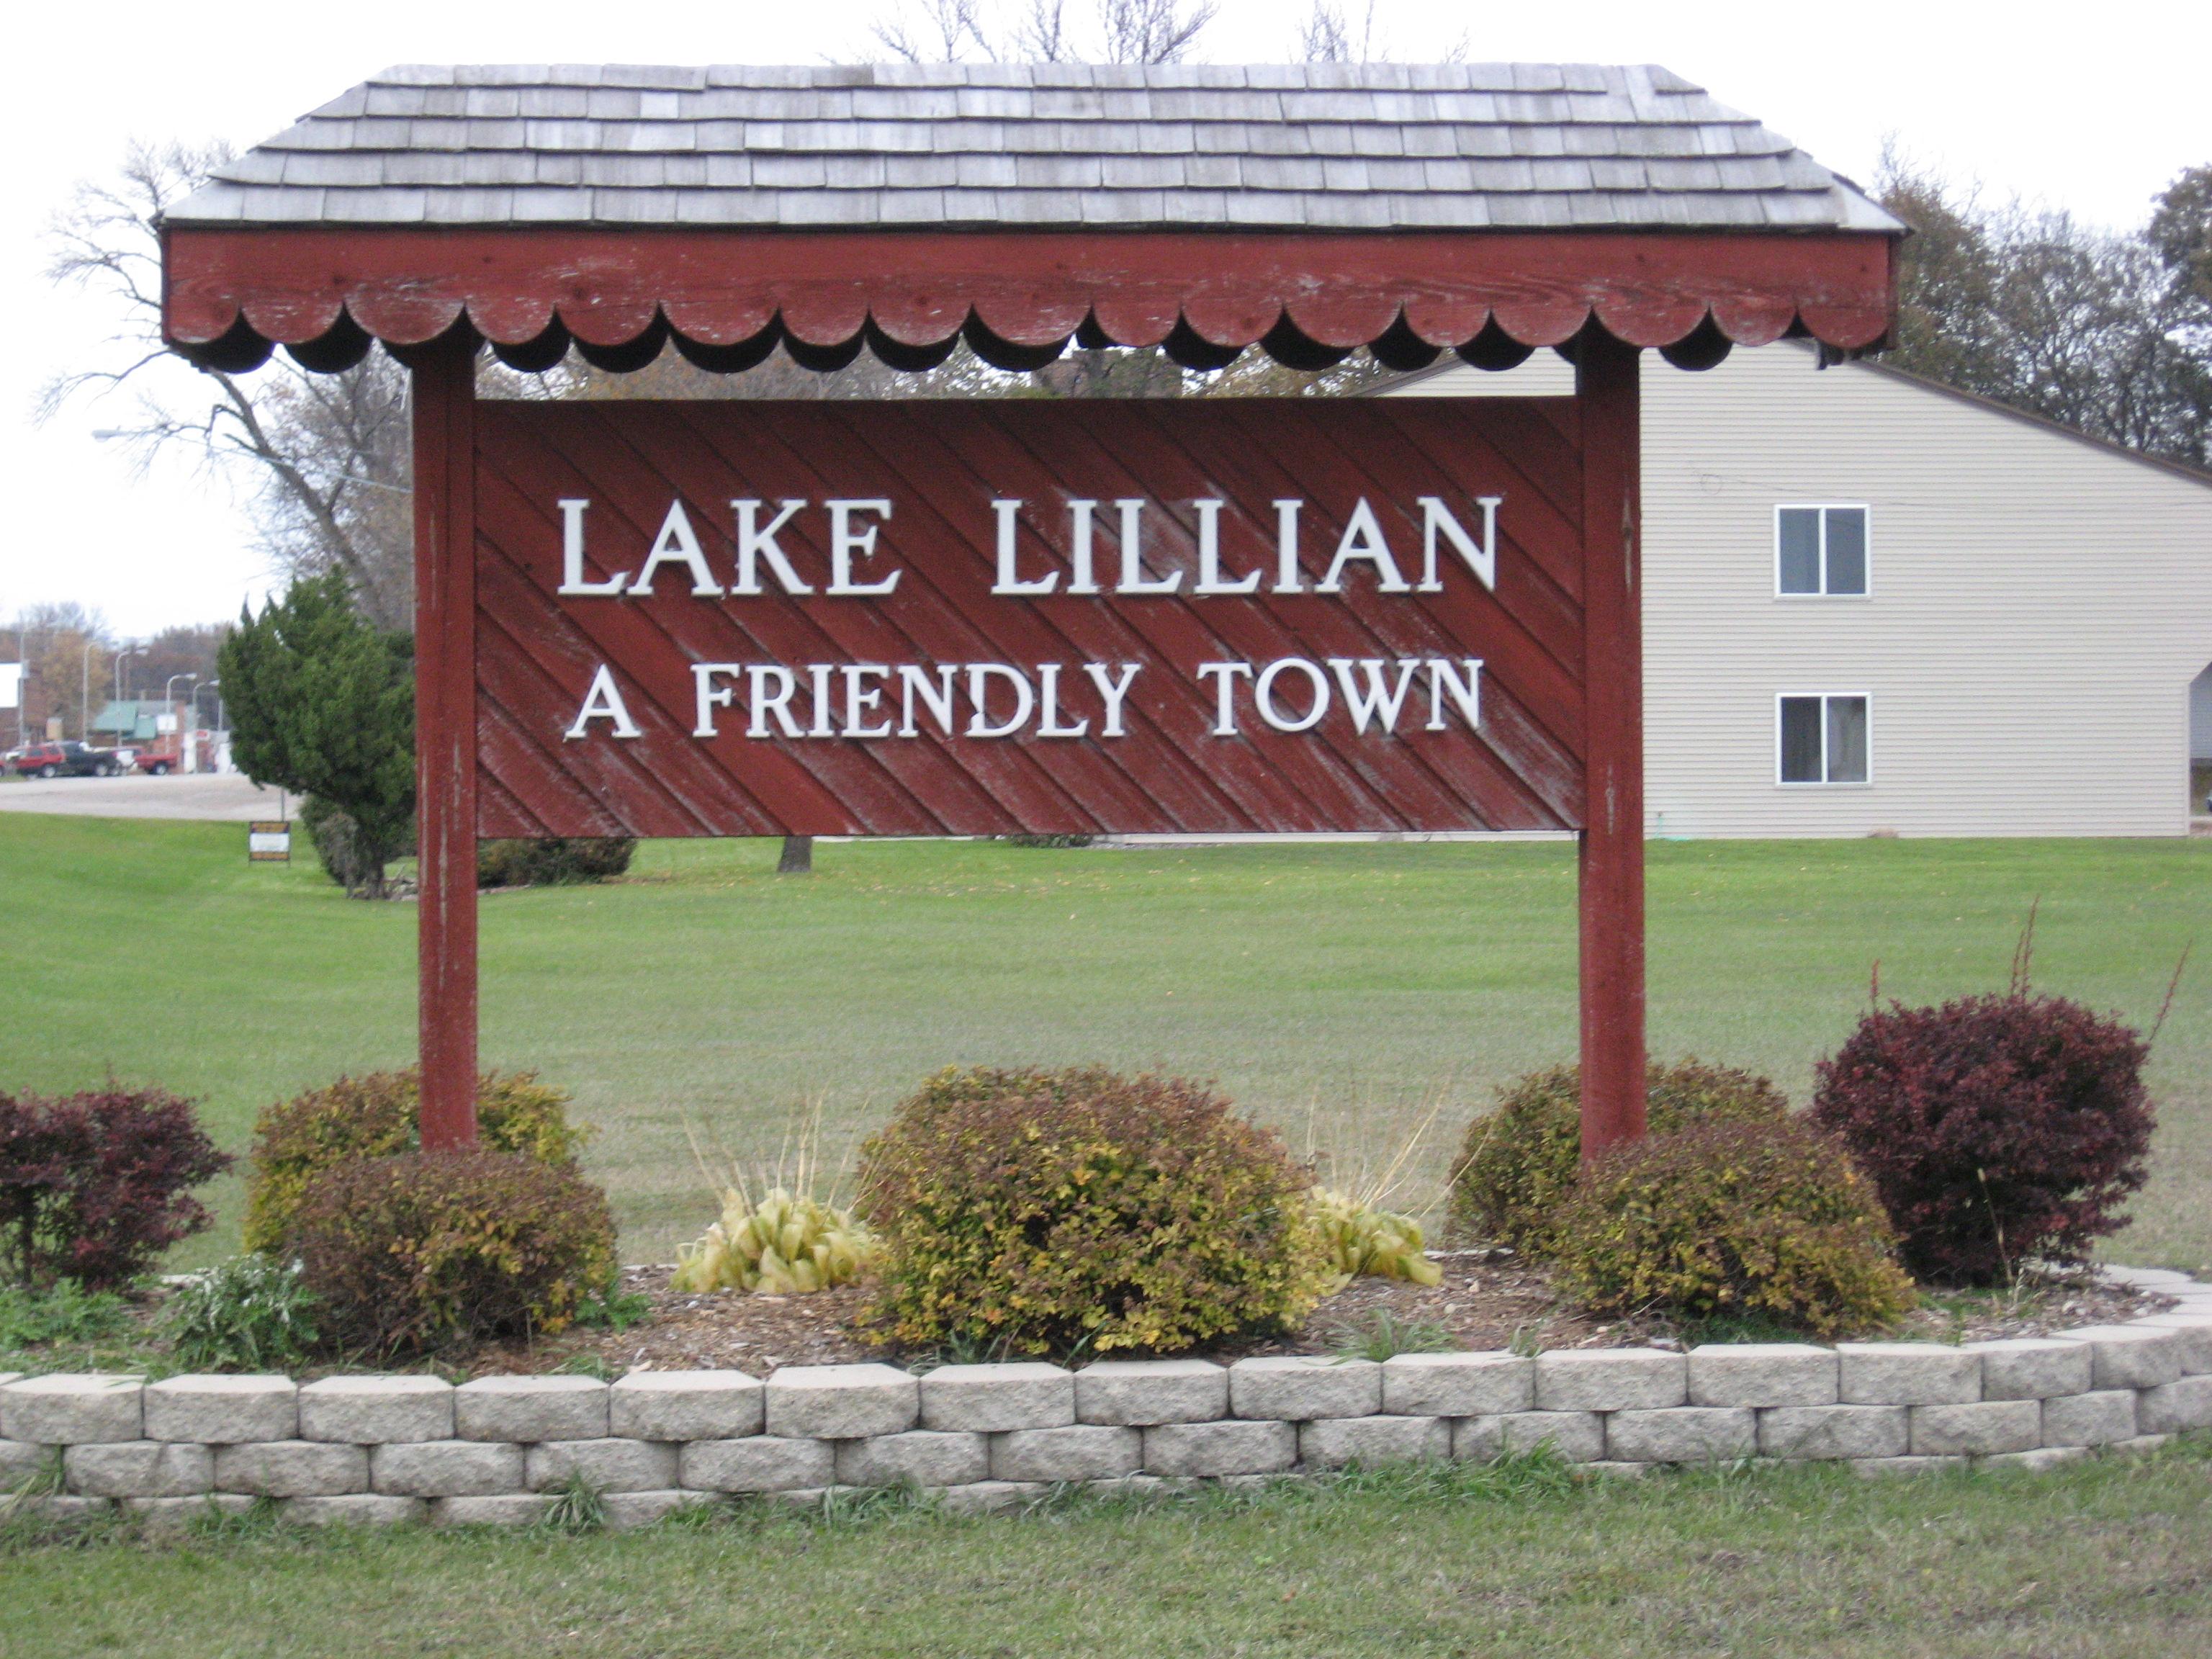 Lake Lillian MN Middle Eastern Single Men